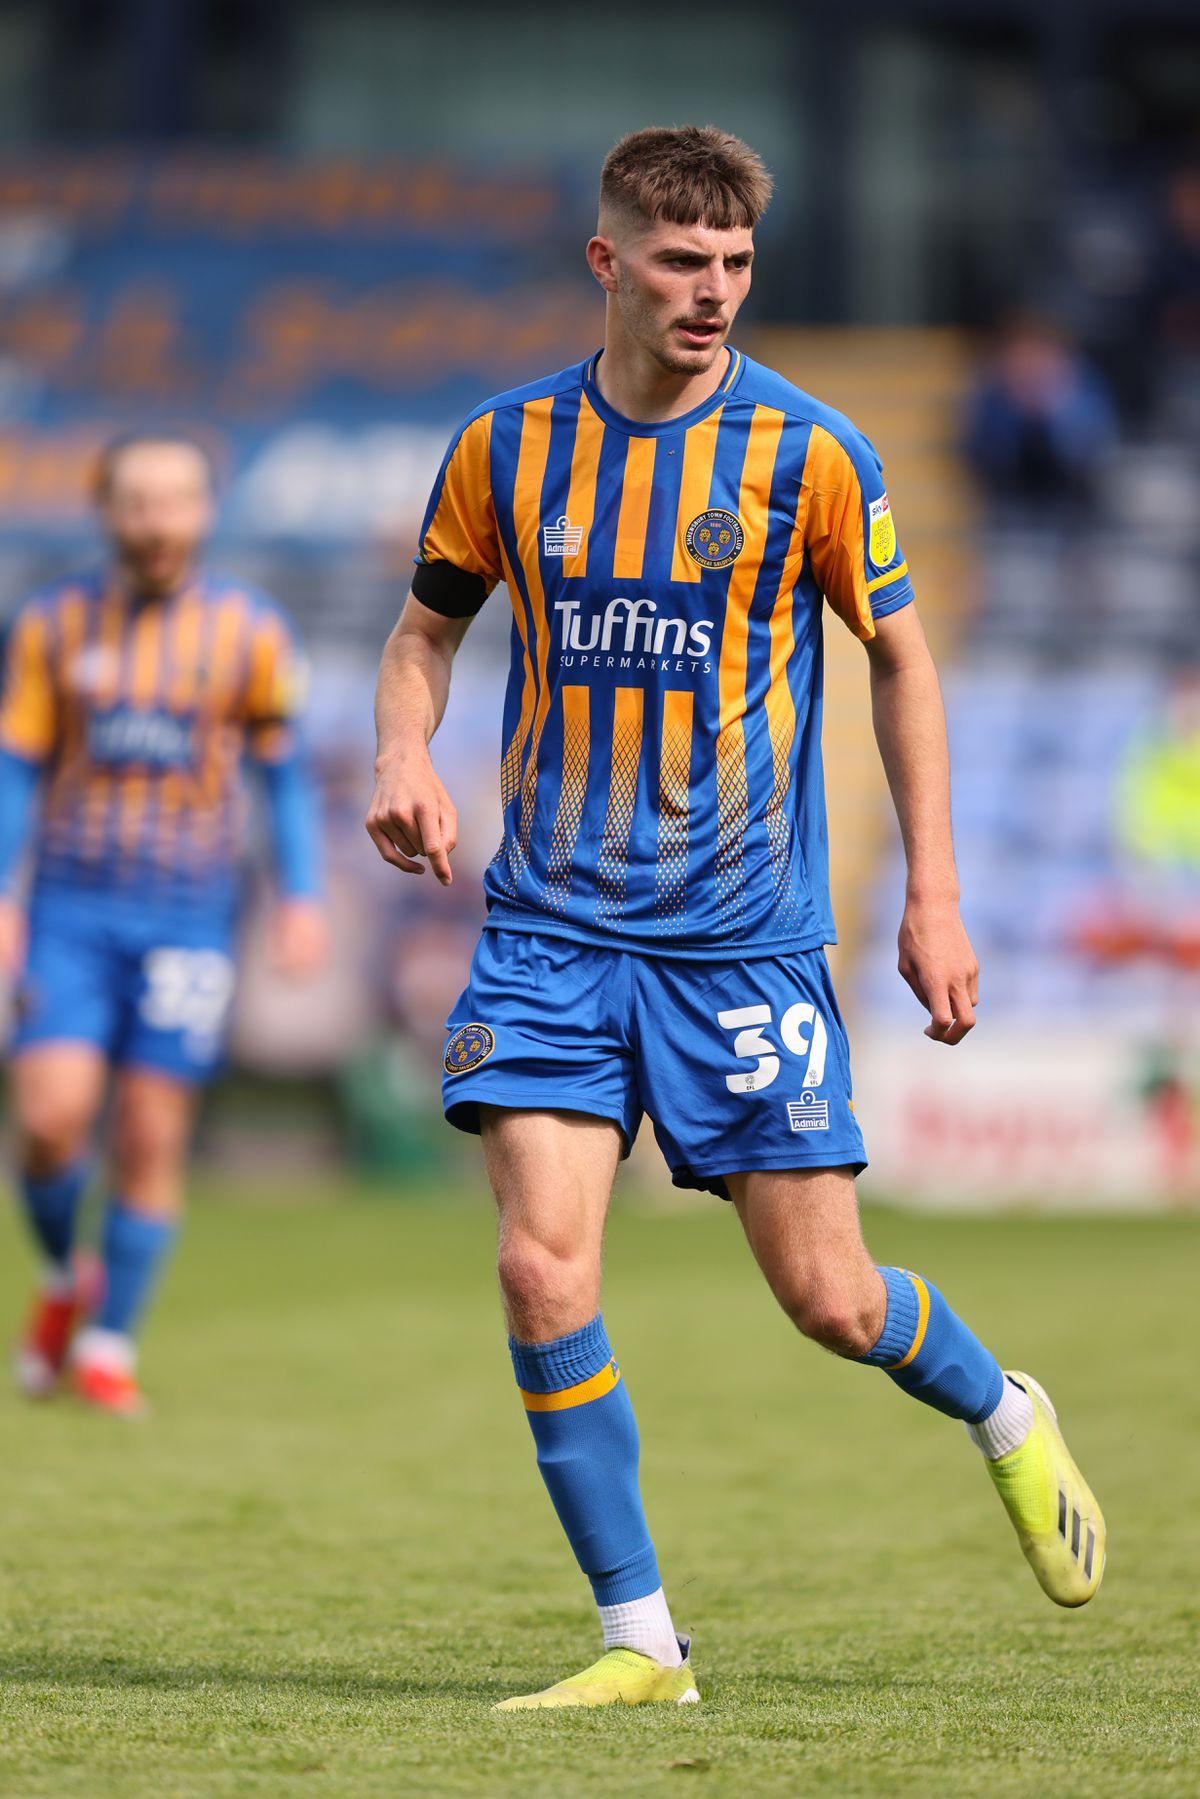 Tom Bloxham of Shrewsbury Town. (AMA)